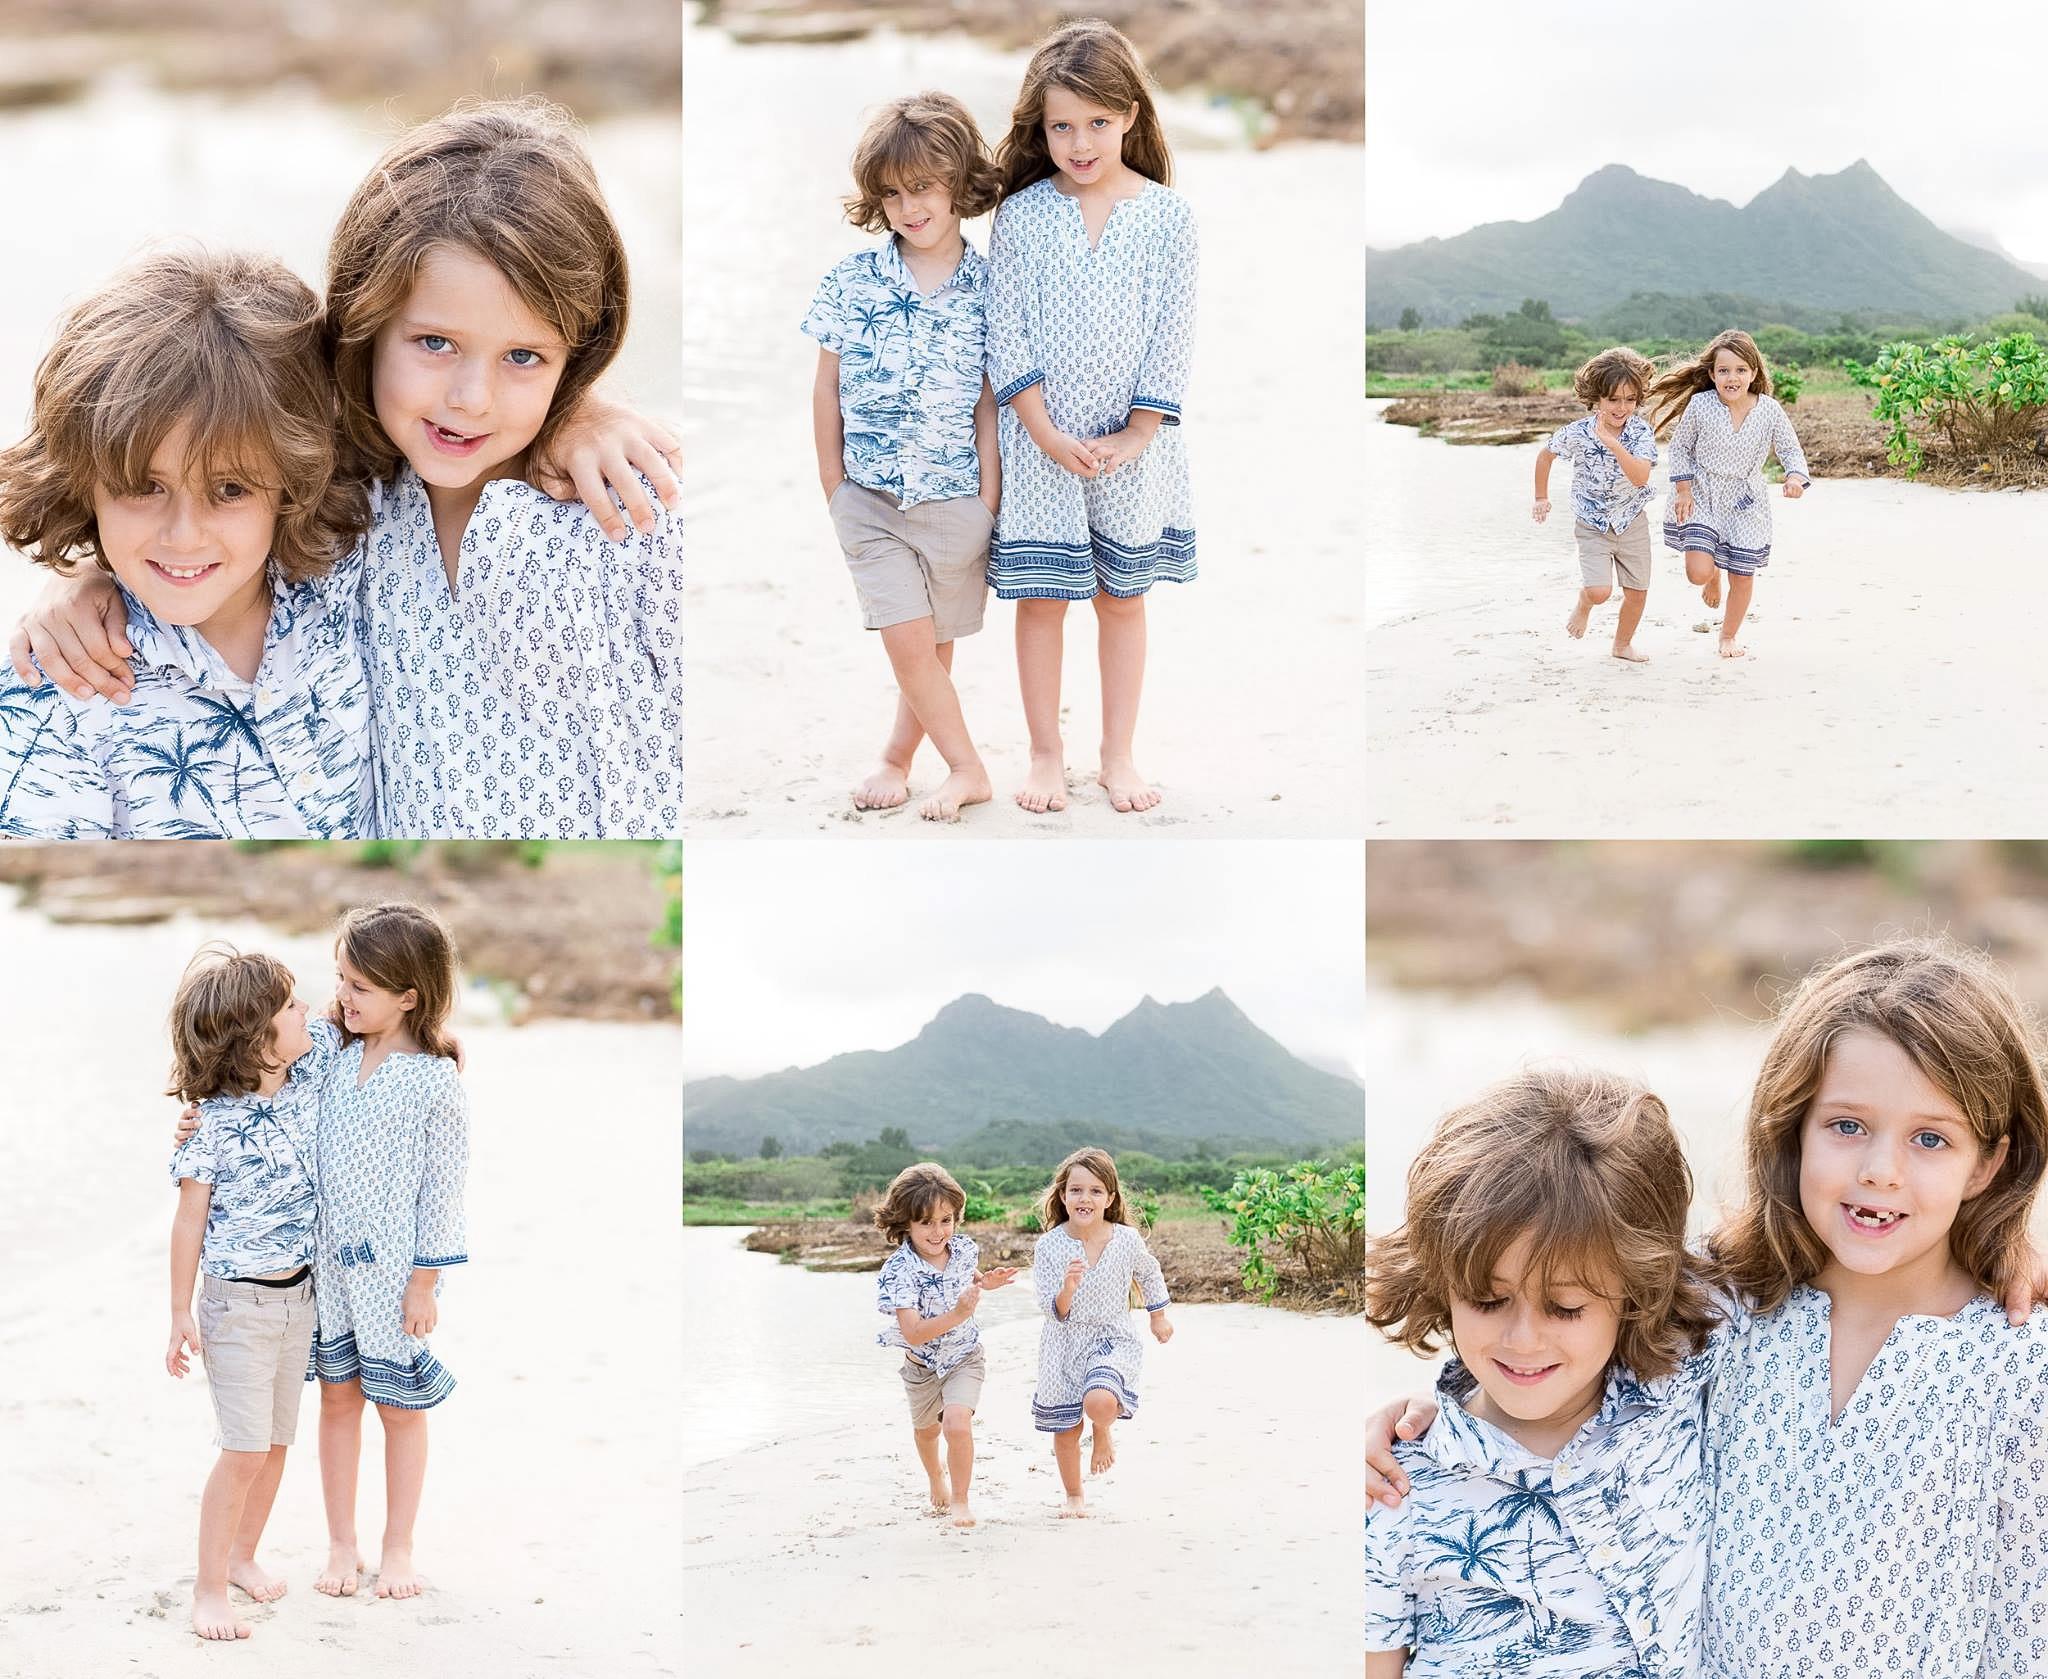 Oahu-Family-Photographer-kids-1.jpg